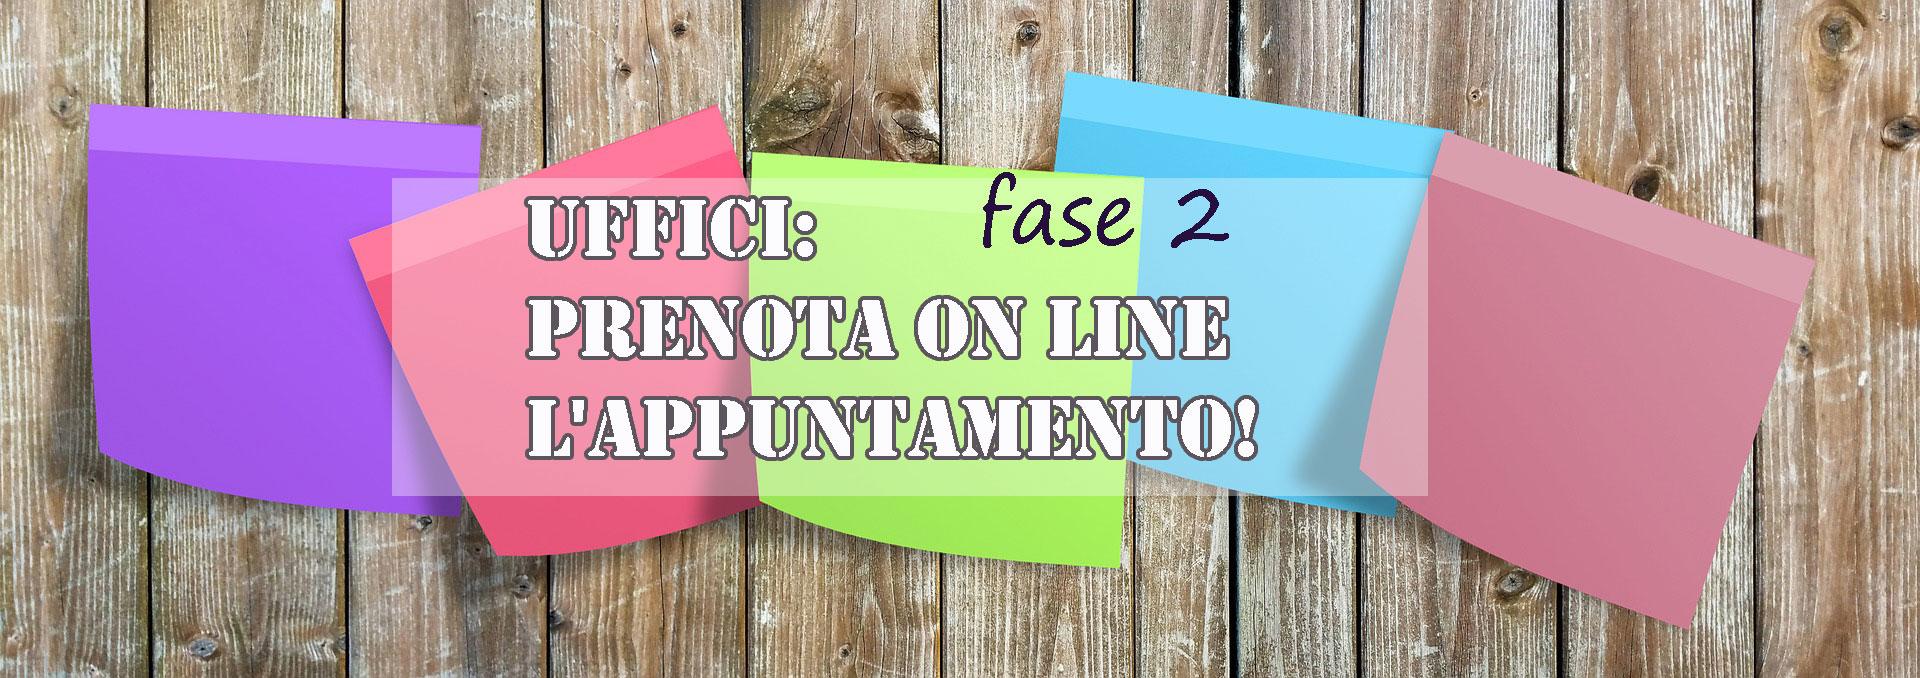 uffici fase 2 prenota on line locandina